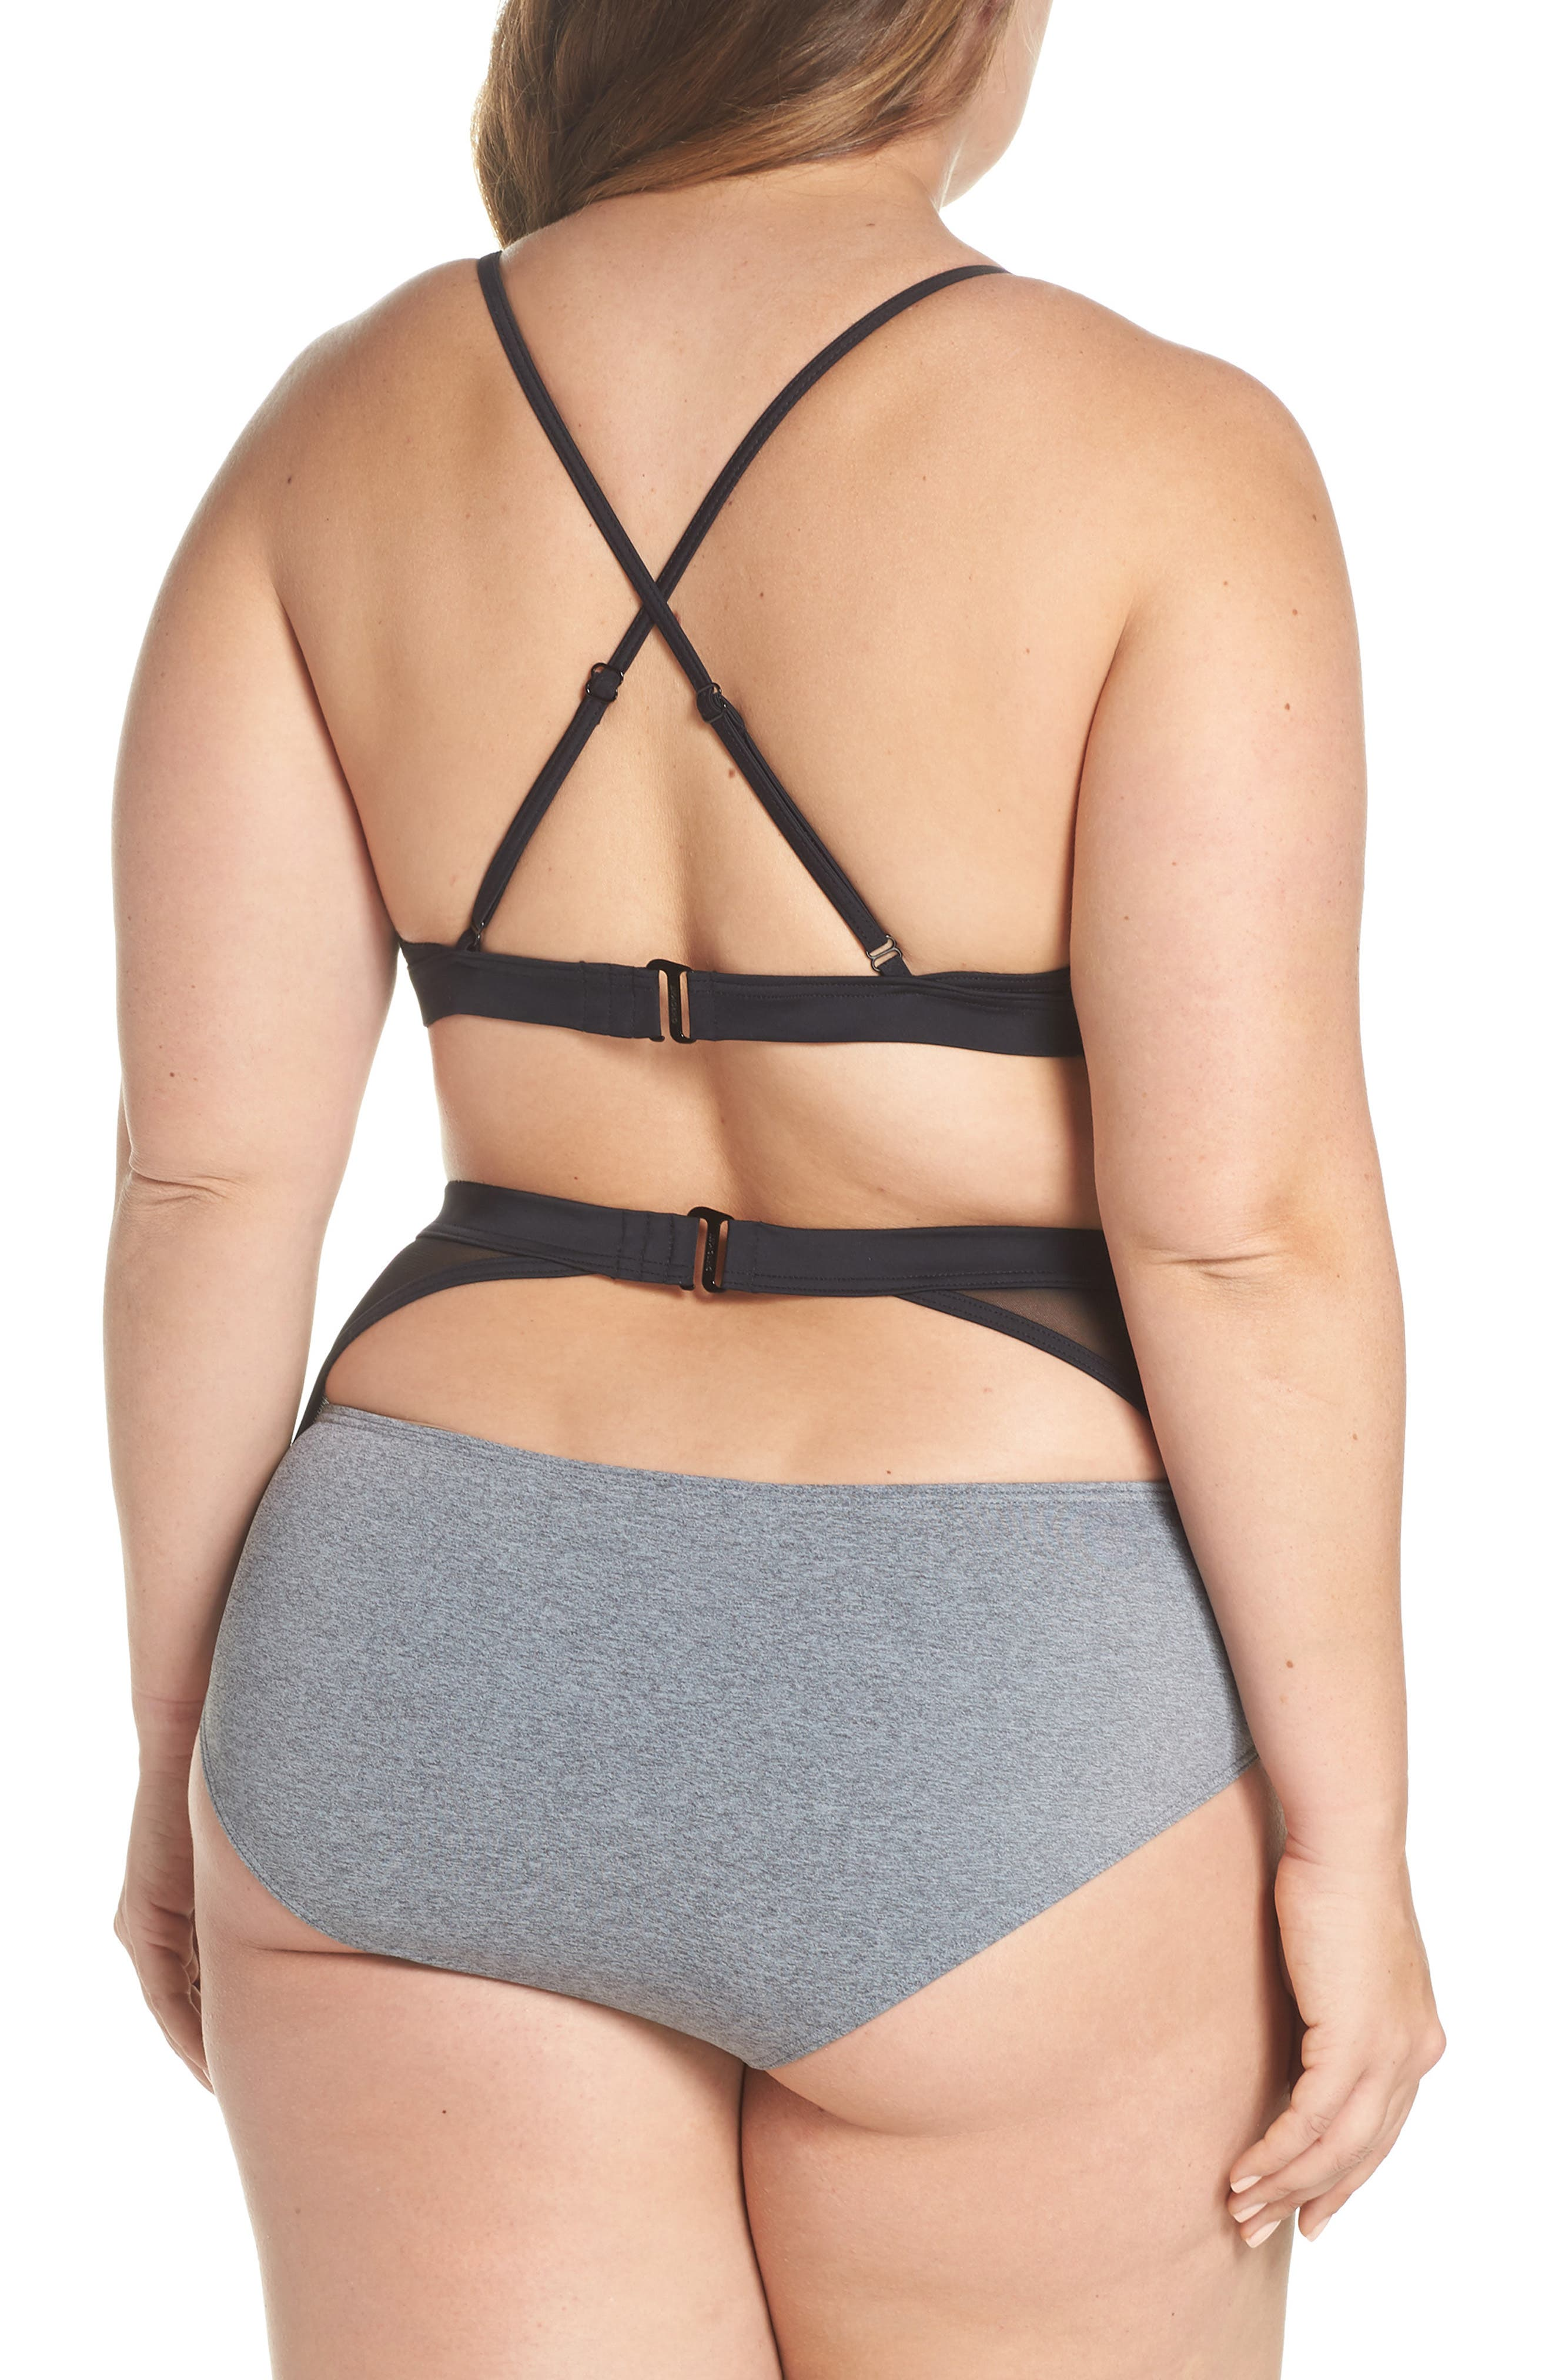 Alva Bikini Top,                             Alternate thumbnail 13, color,                             Heather Grey